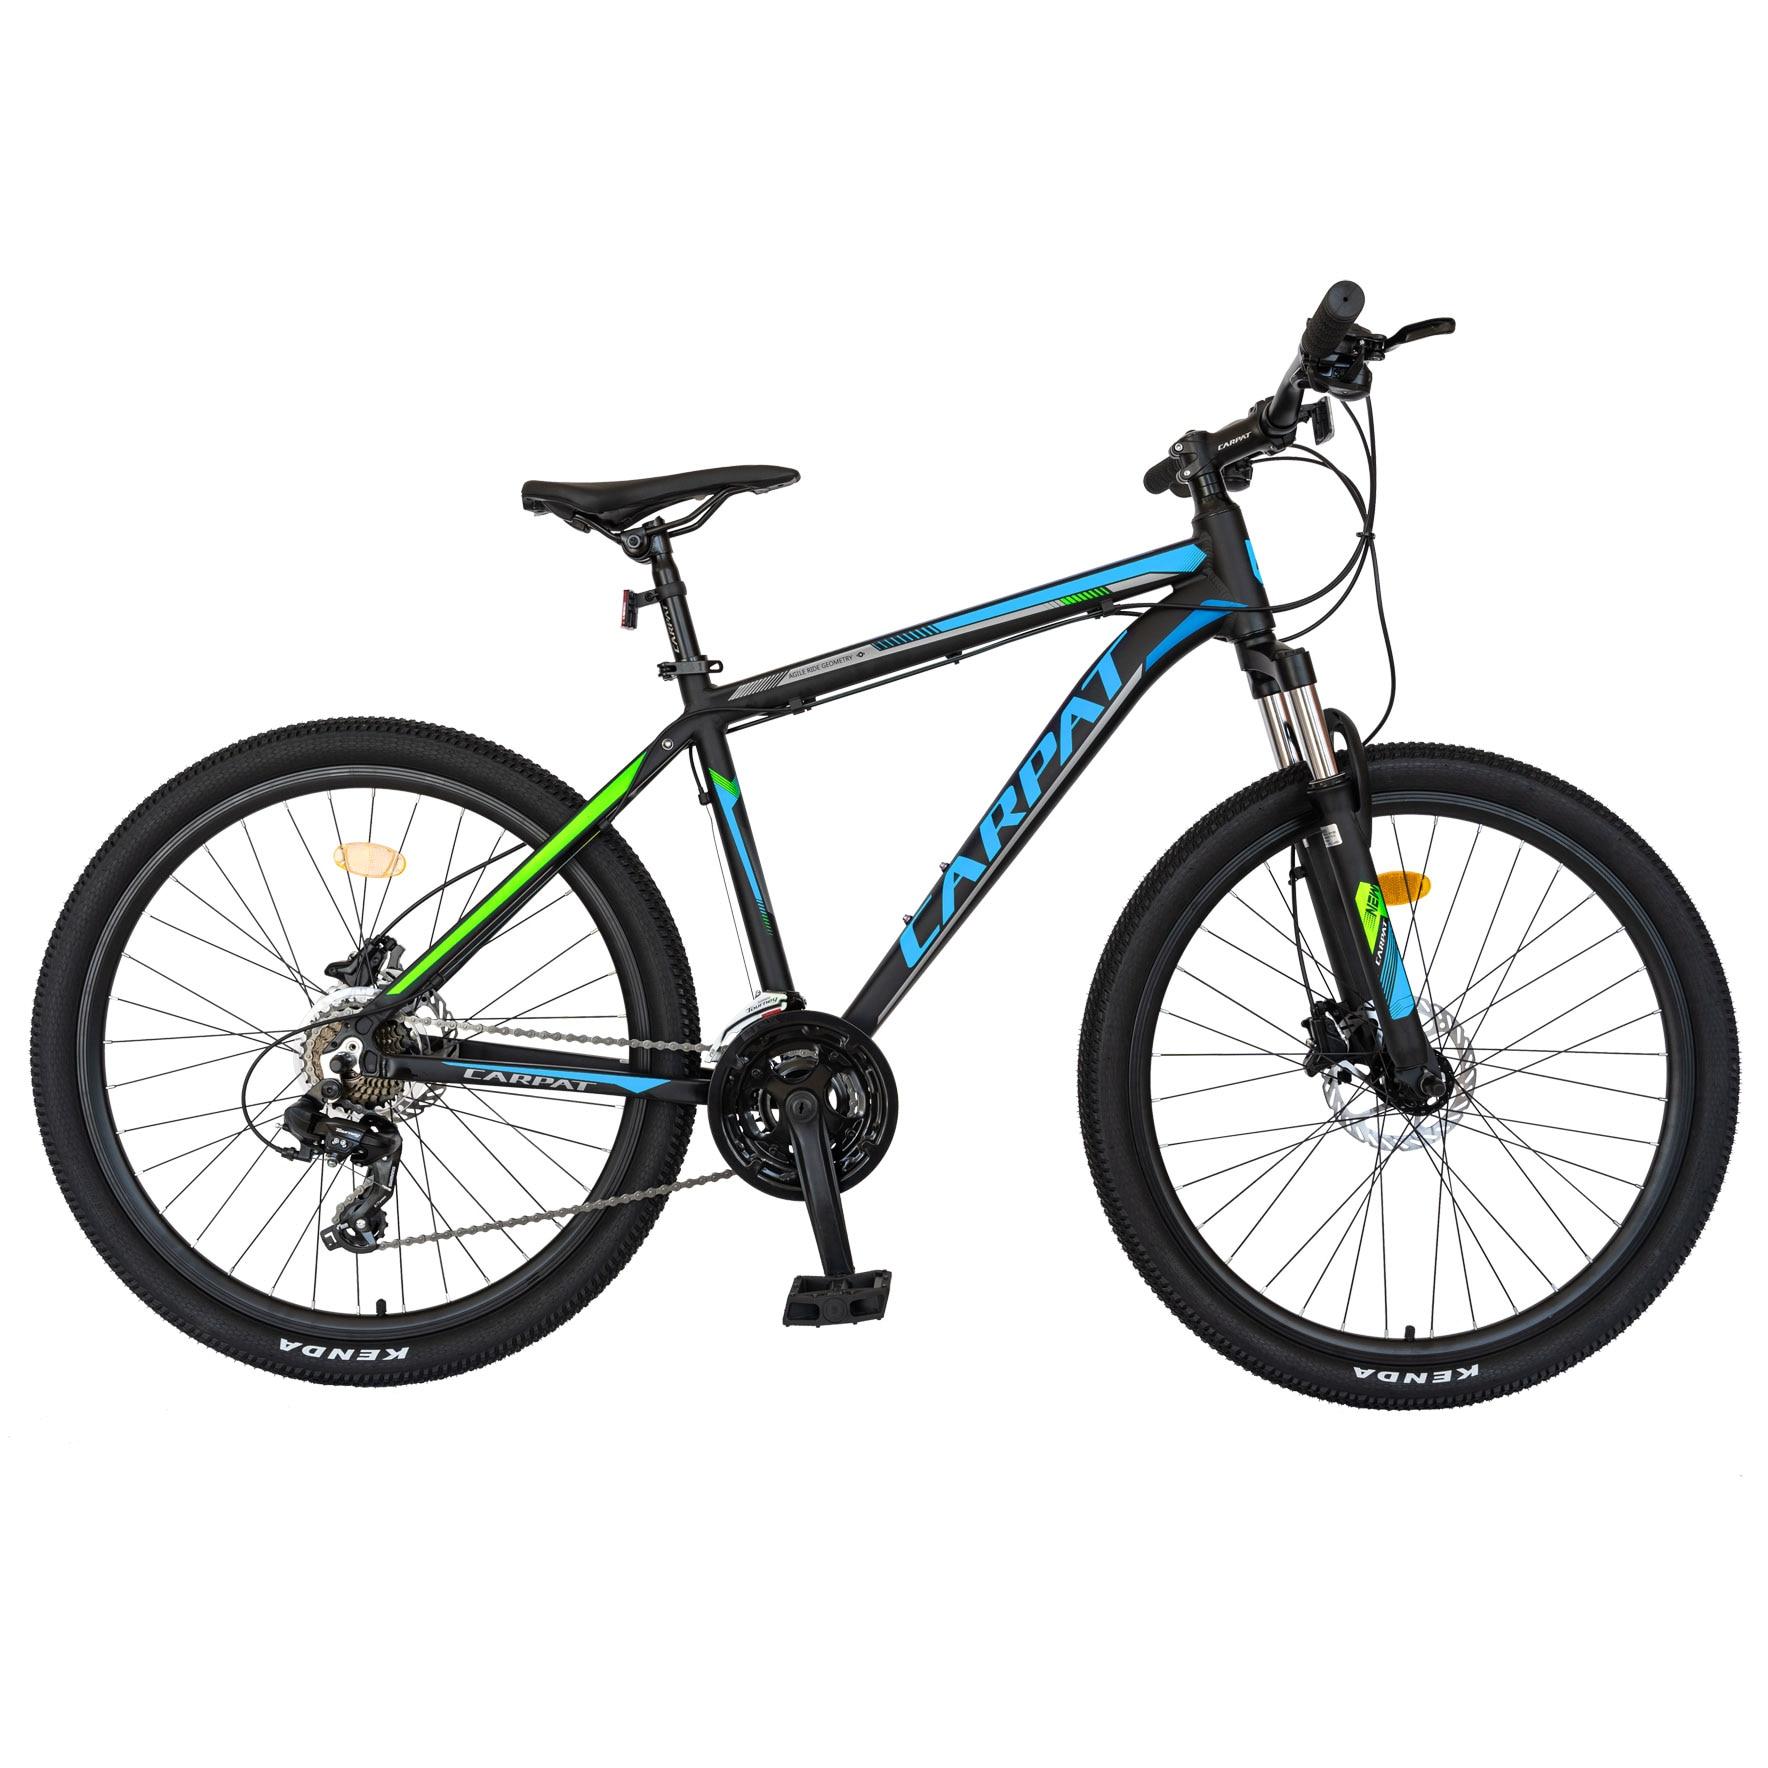 "Fotografie Bicicleta MTB 26"" Carpat C2681H, frana Hidraulica, transmisie Shimano, Negru/Albastru"